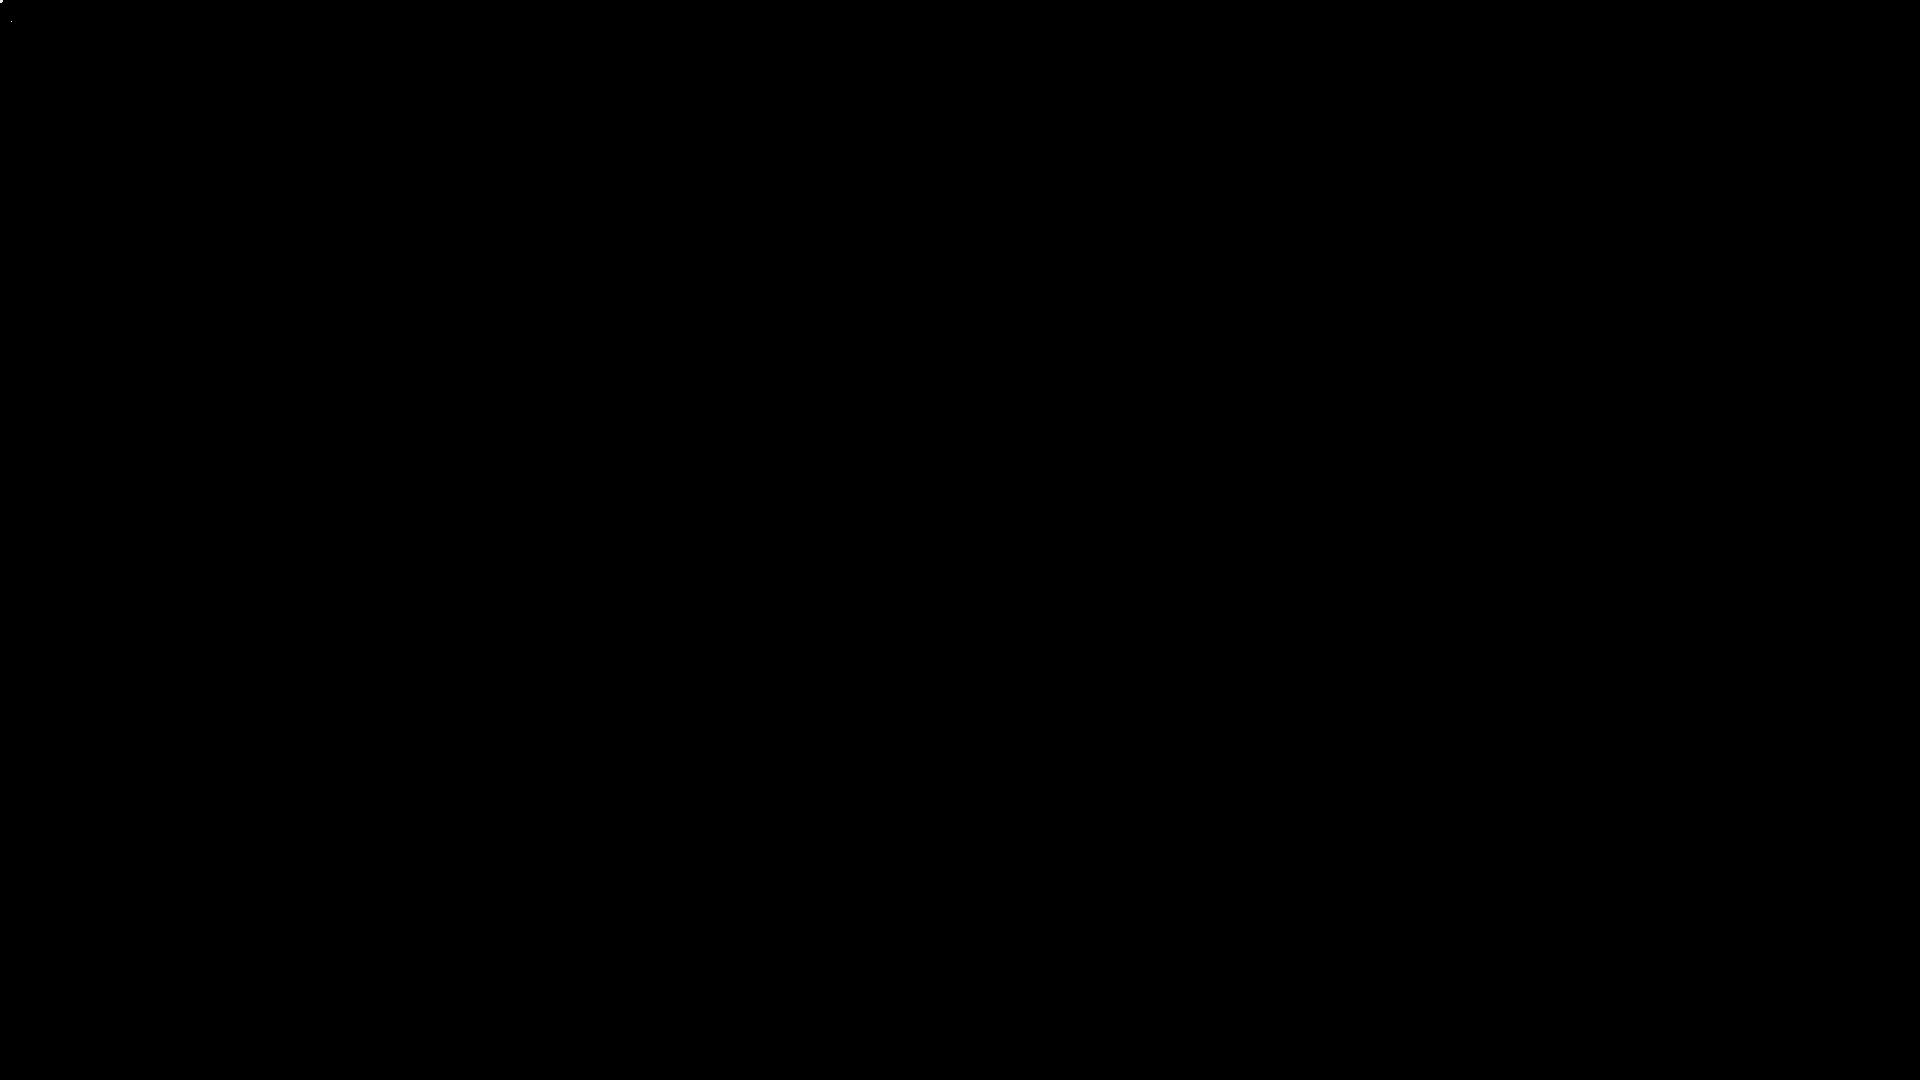 Sostienici